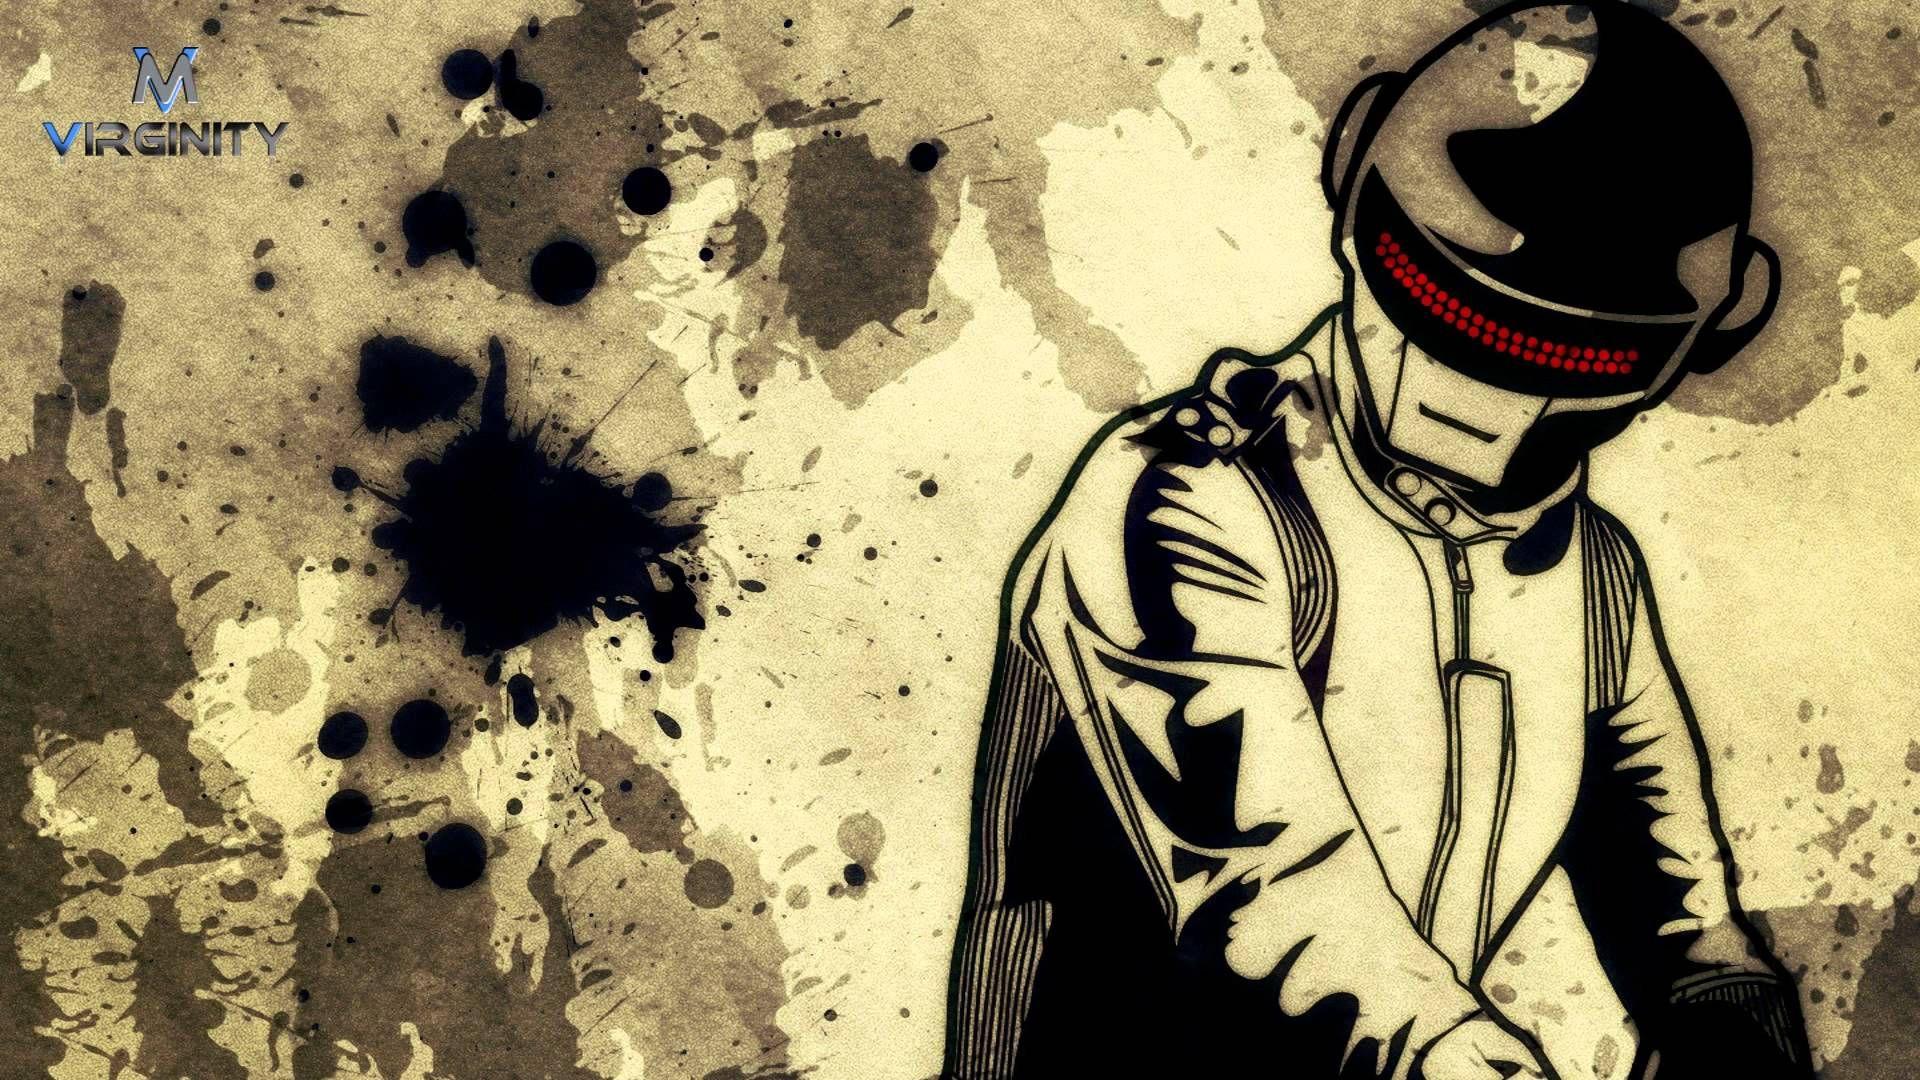 Daft Punk - Faster Stronger (No Hopes Remix) [DeepHouse] | Music ...